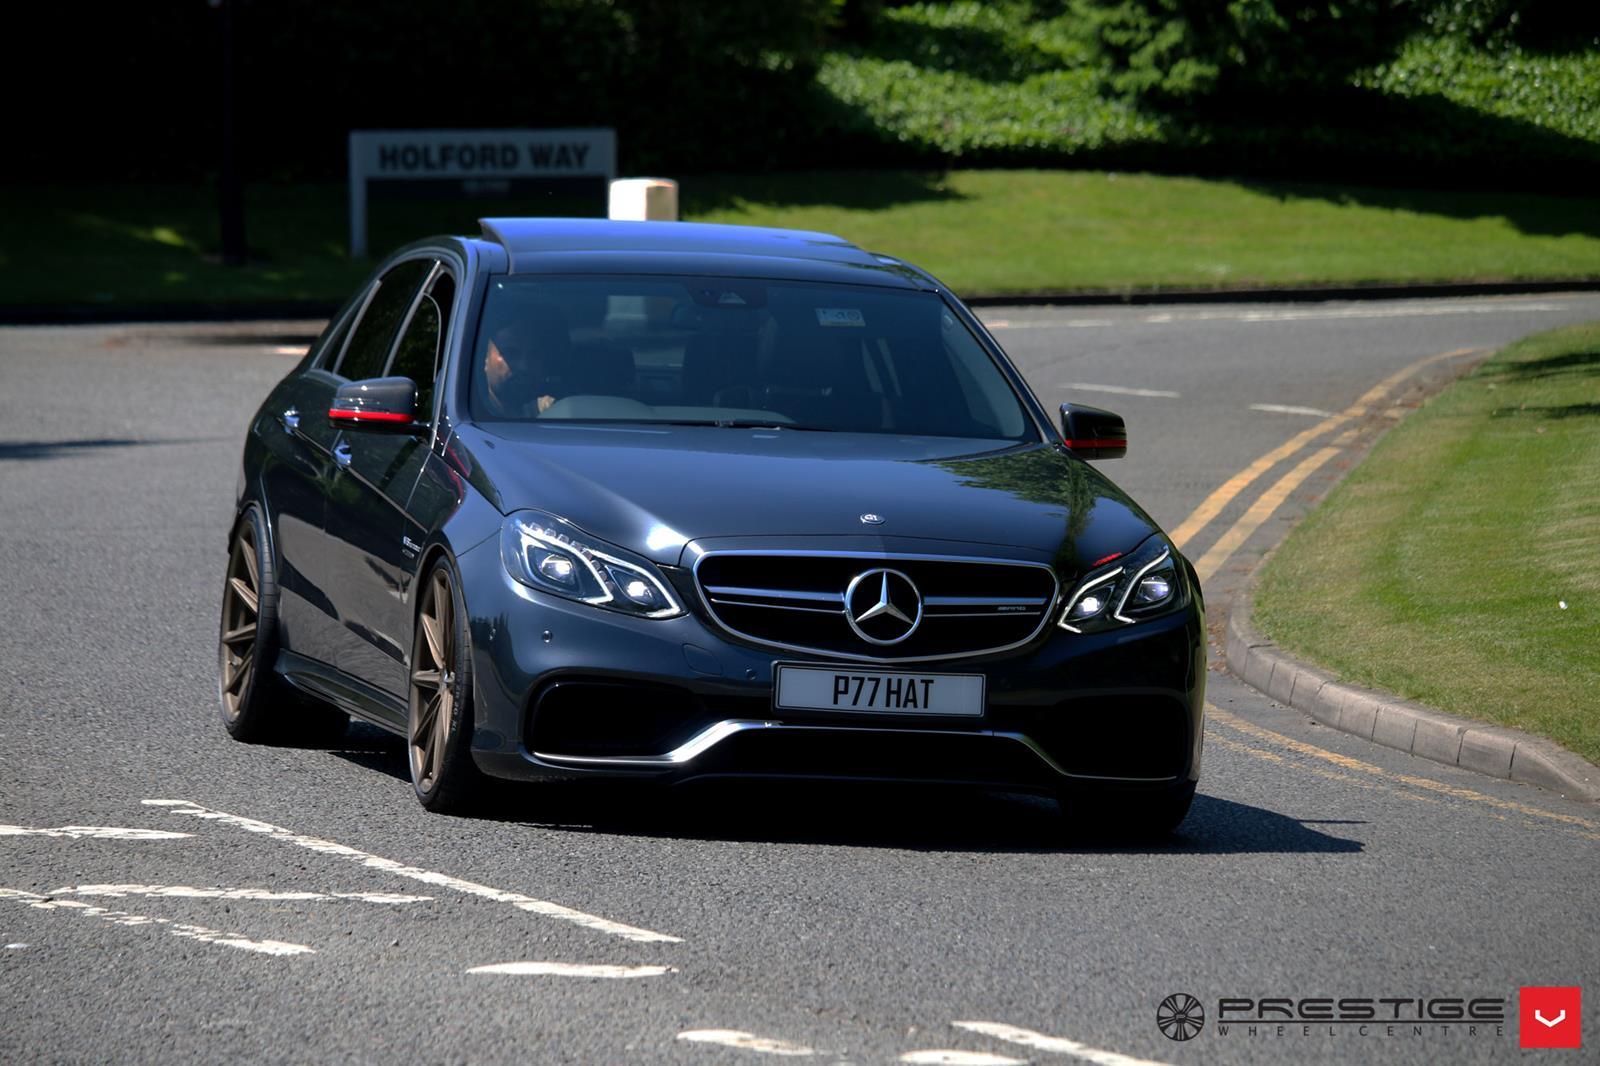 Mercedes benz w212 e63 amg on vossen vfs10 wheels benztuning for Mercedes benz e63 amg